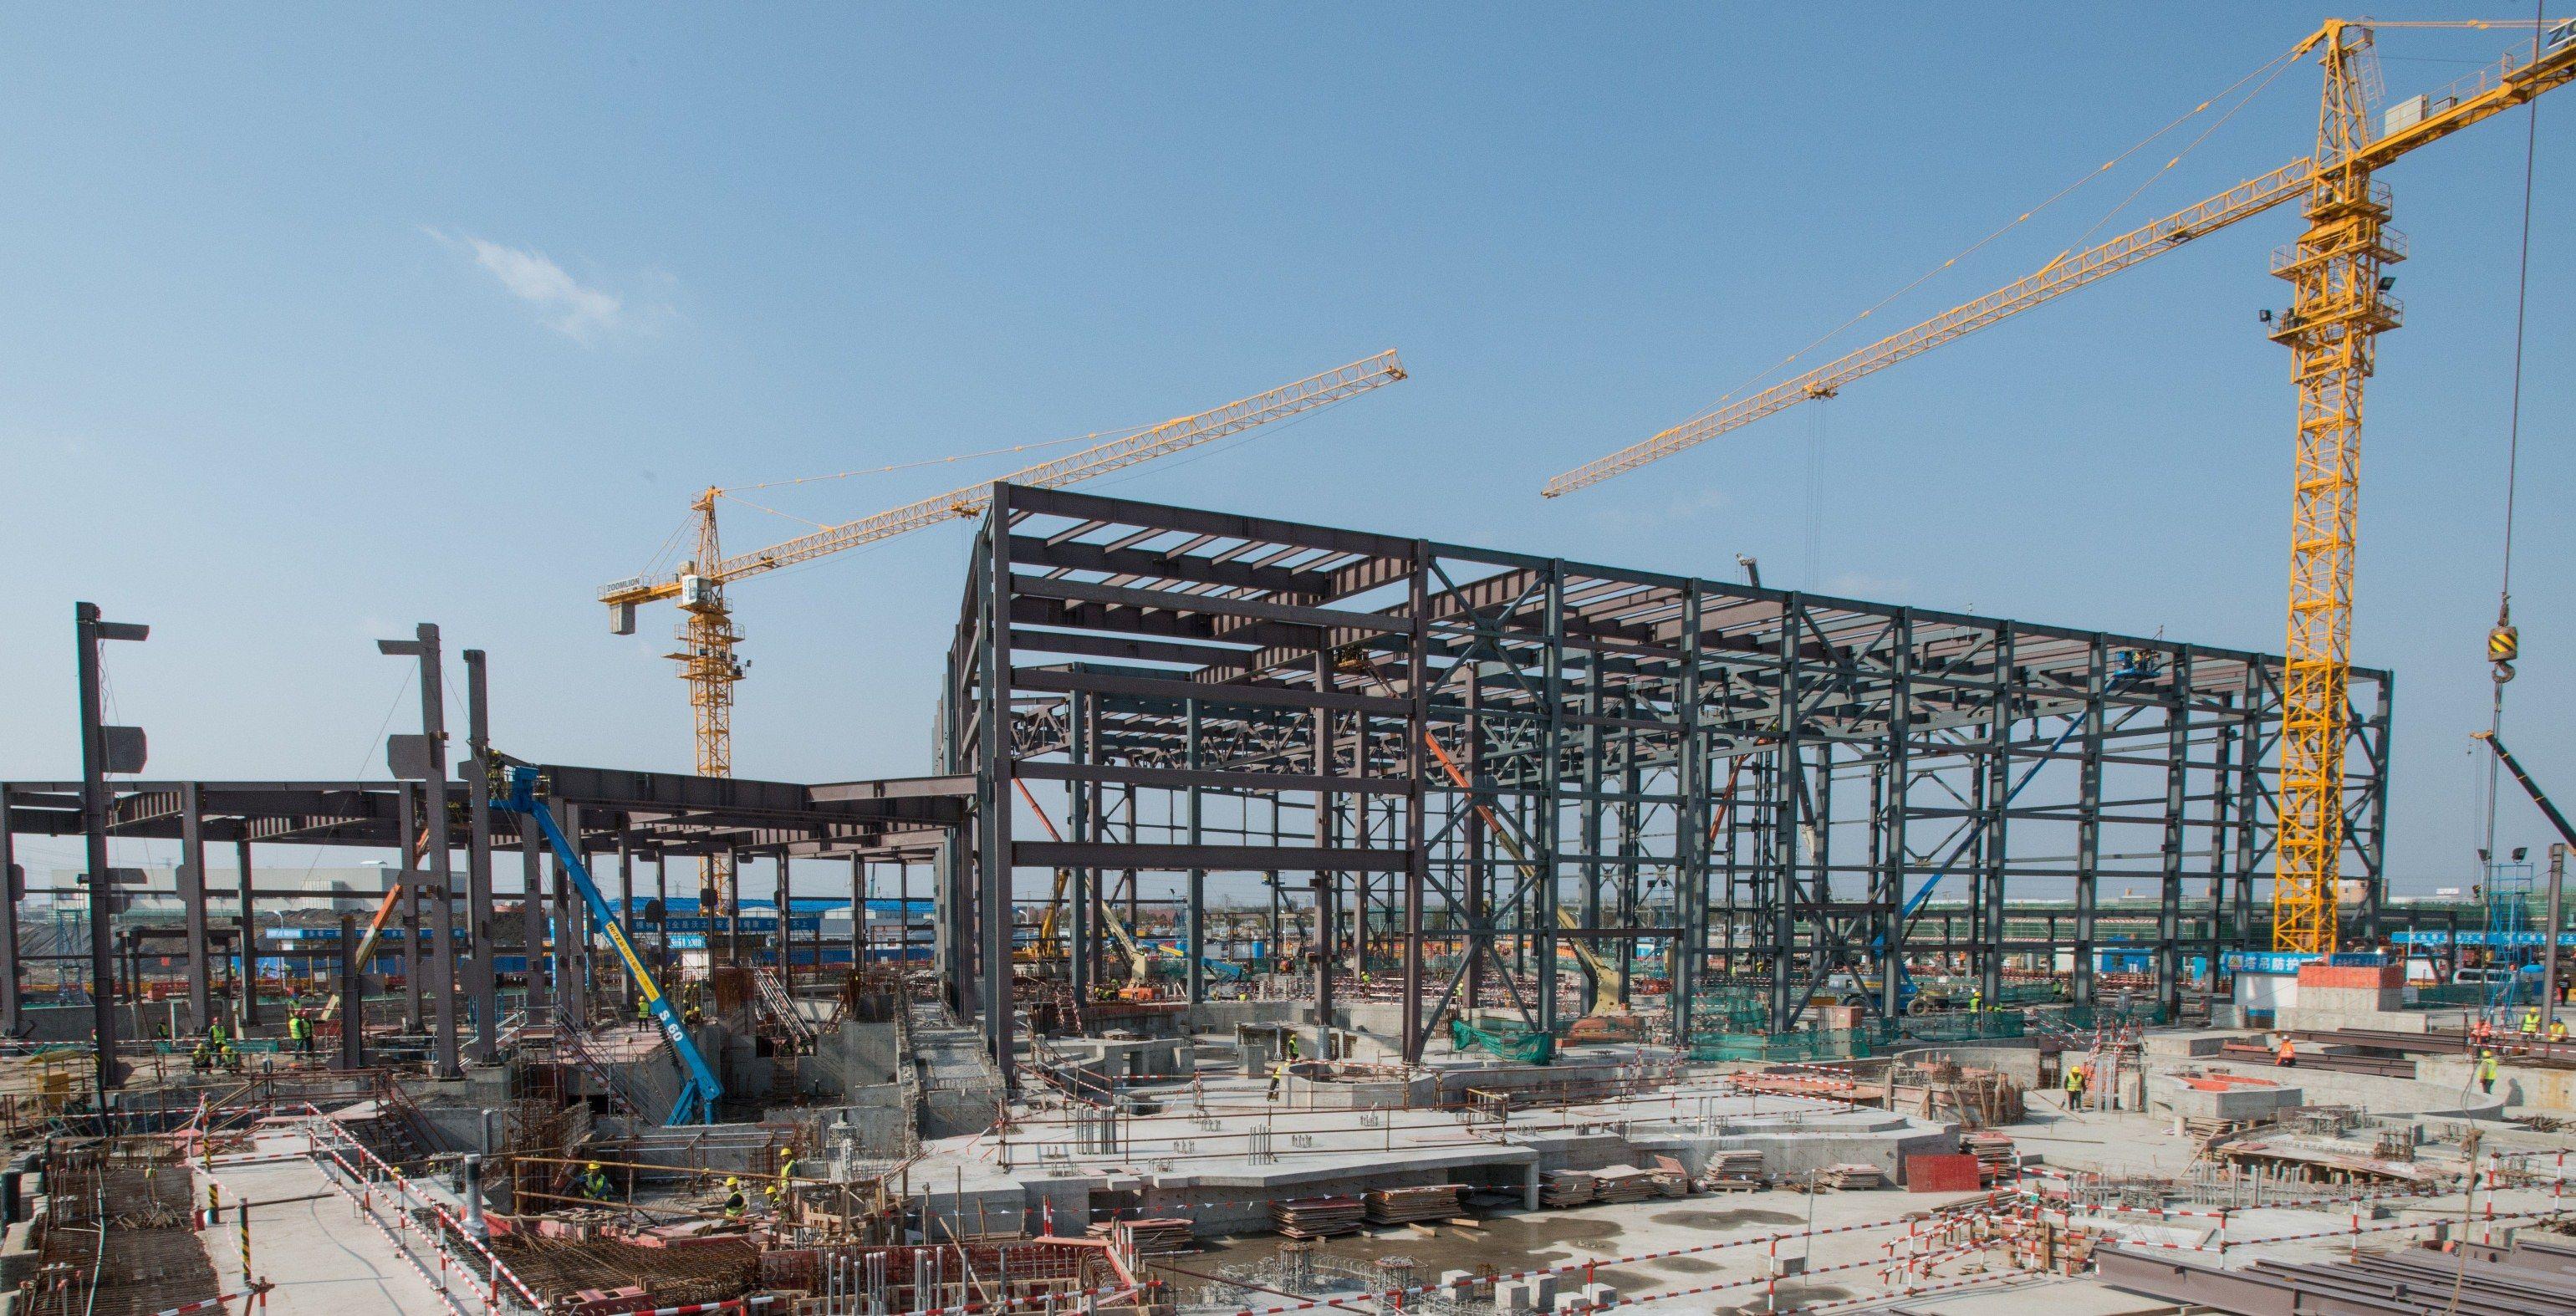 Pirates of the Caribbean, under construction at Shanghai Disneyland in Match 2014. Photo courtesy Disney.